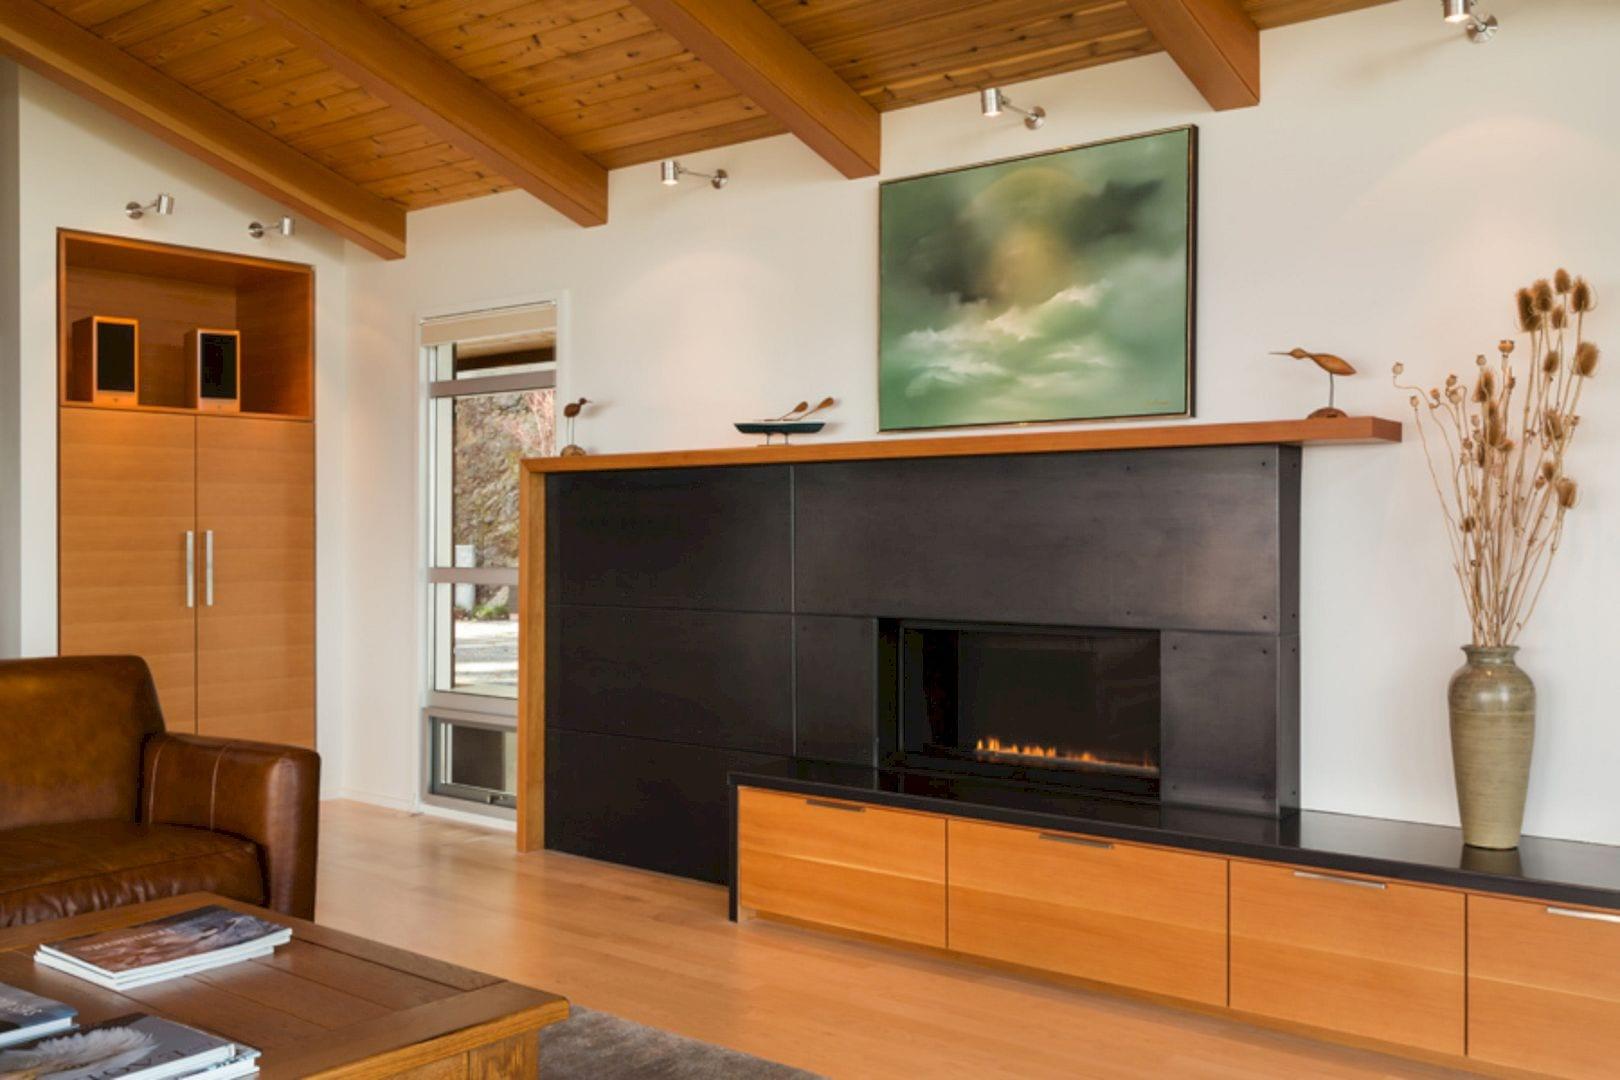 San Juan Remodel By Prentiss Balance Wickline Architects 6